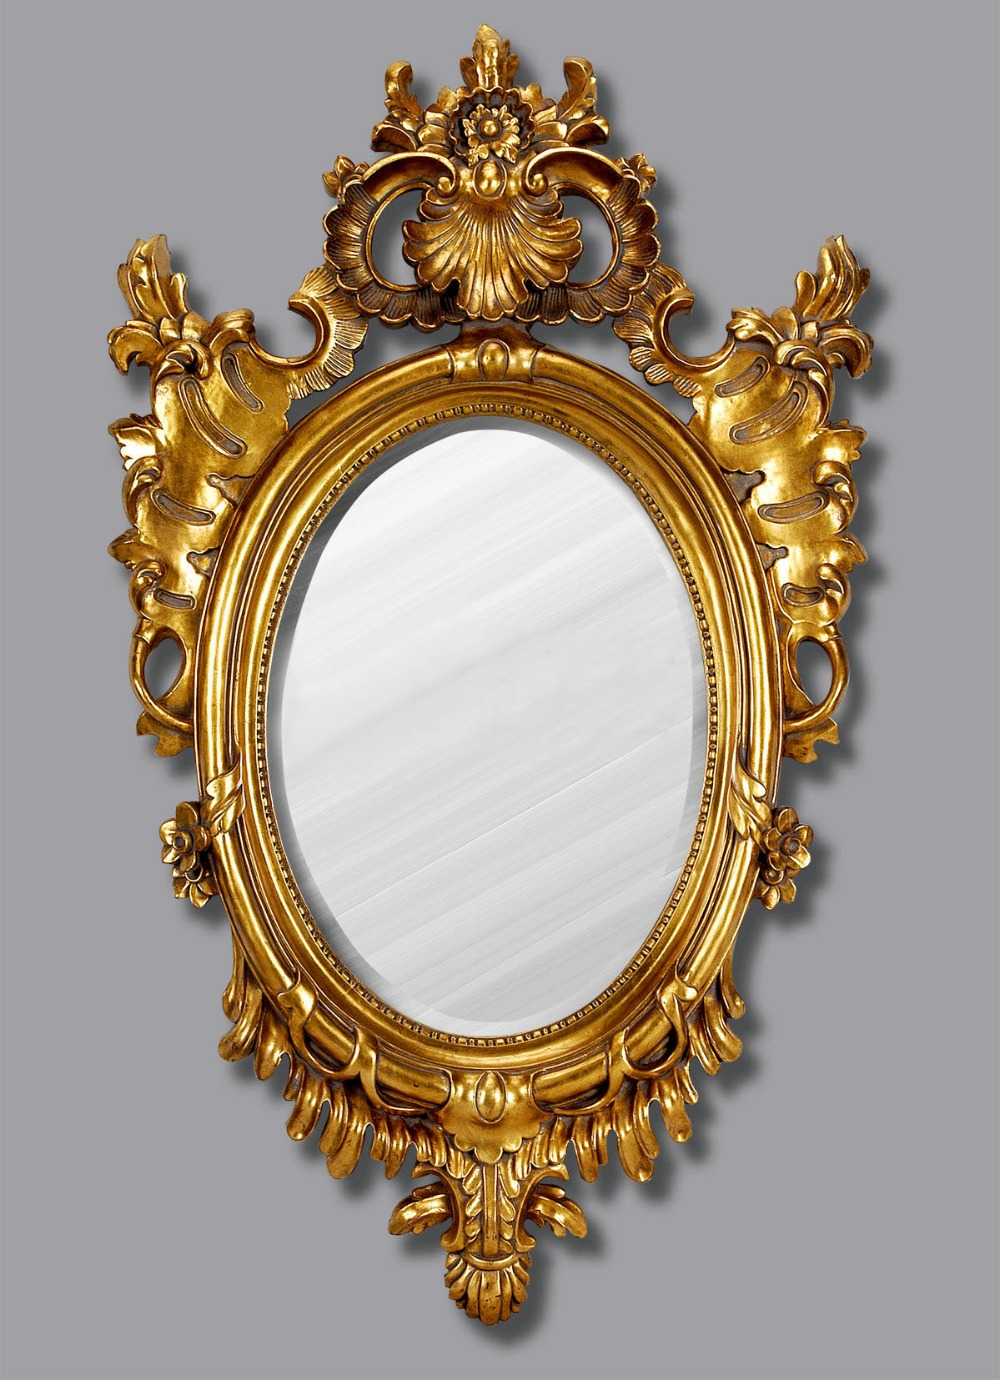 Antico Parete Bagno specchio D\'epoca Retro Resina Classico ...